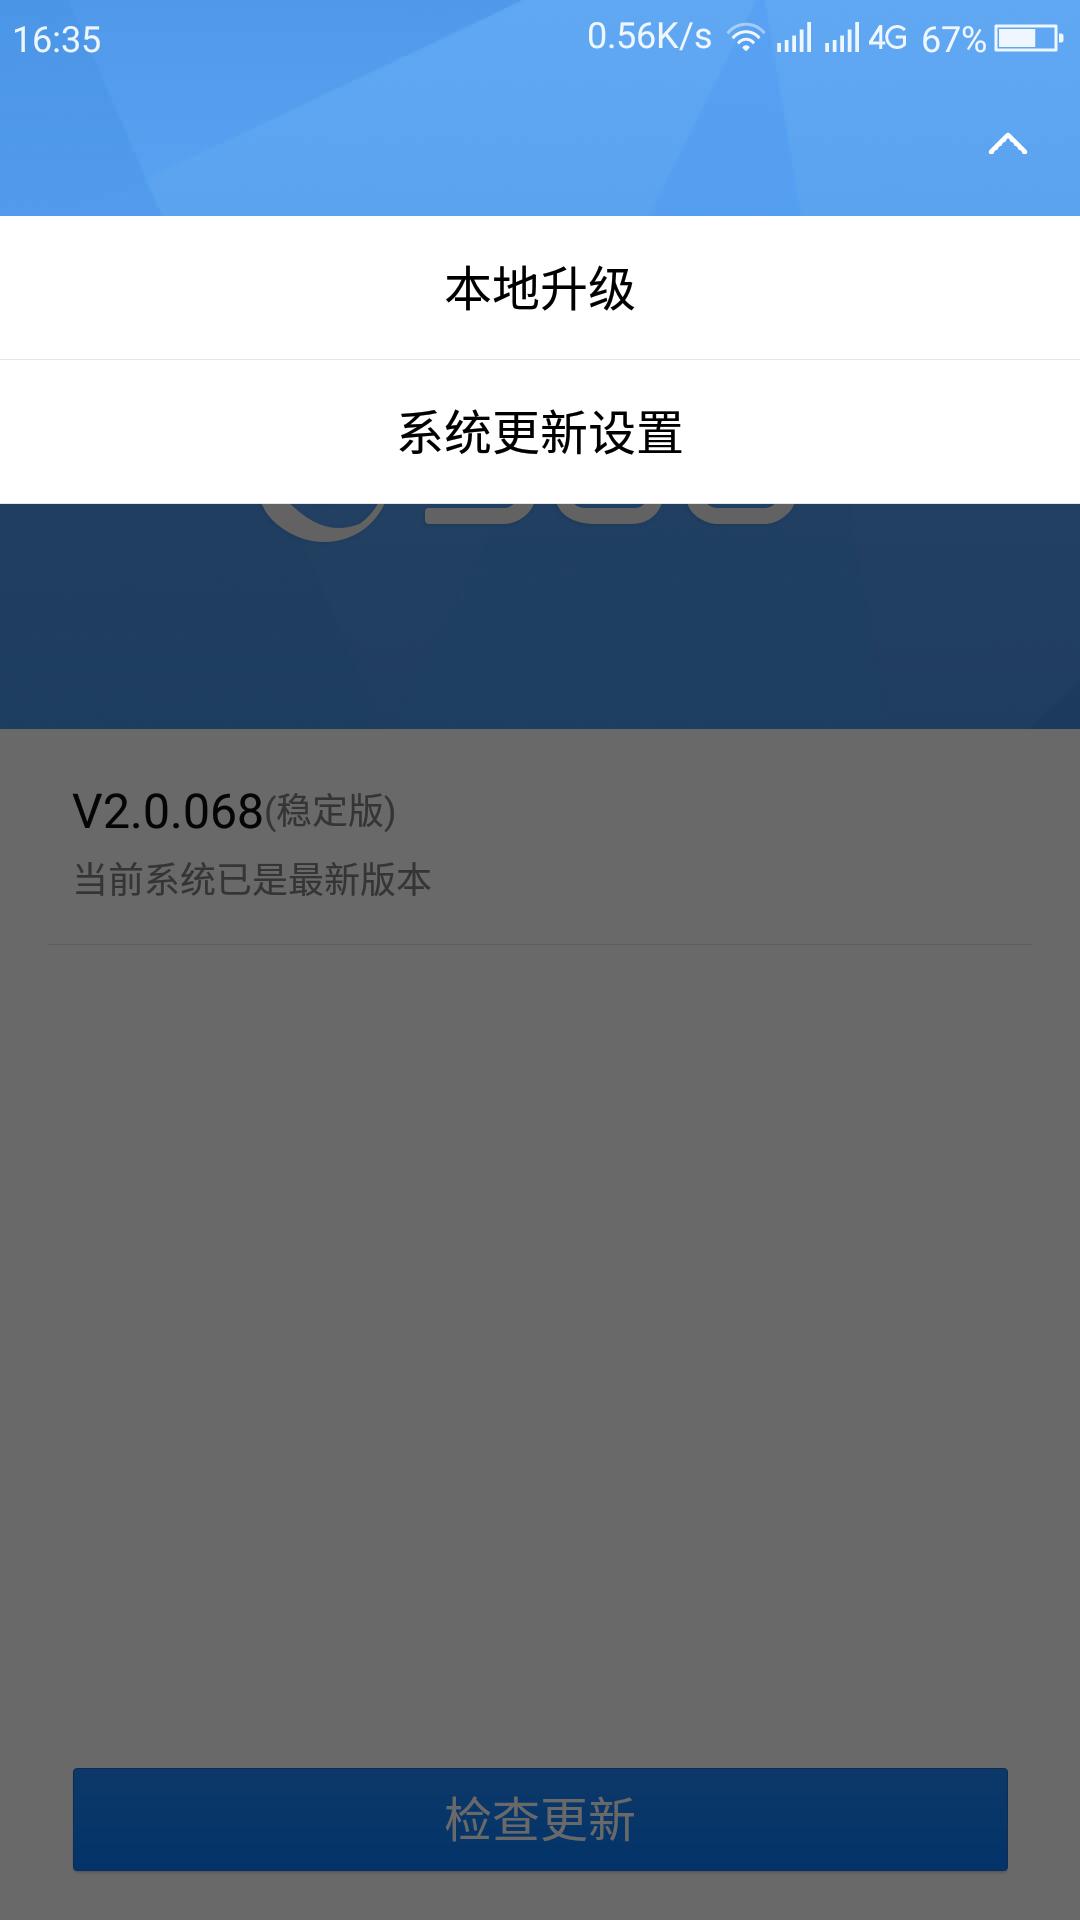 Screenshot_2016-09-21-16-35-50.png